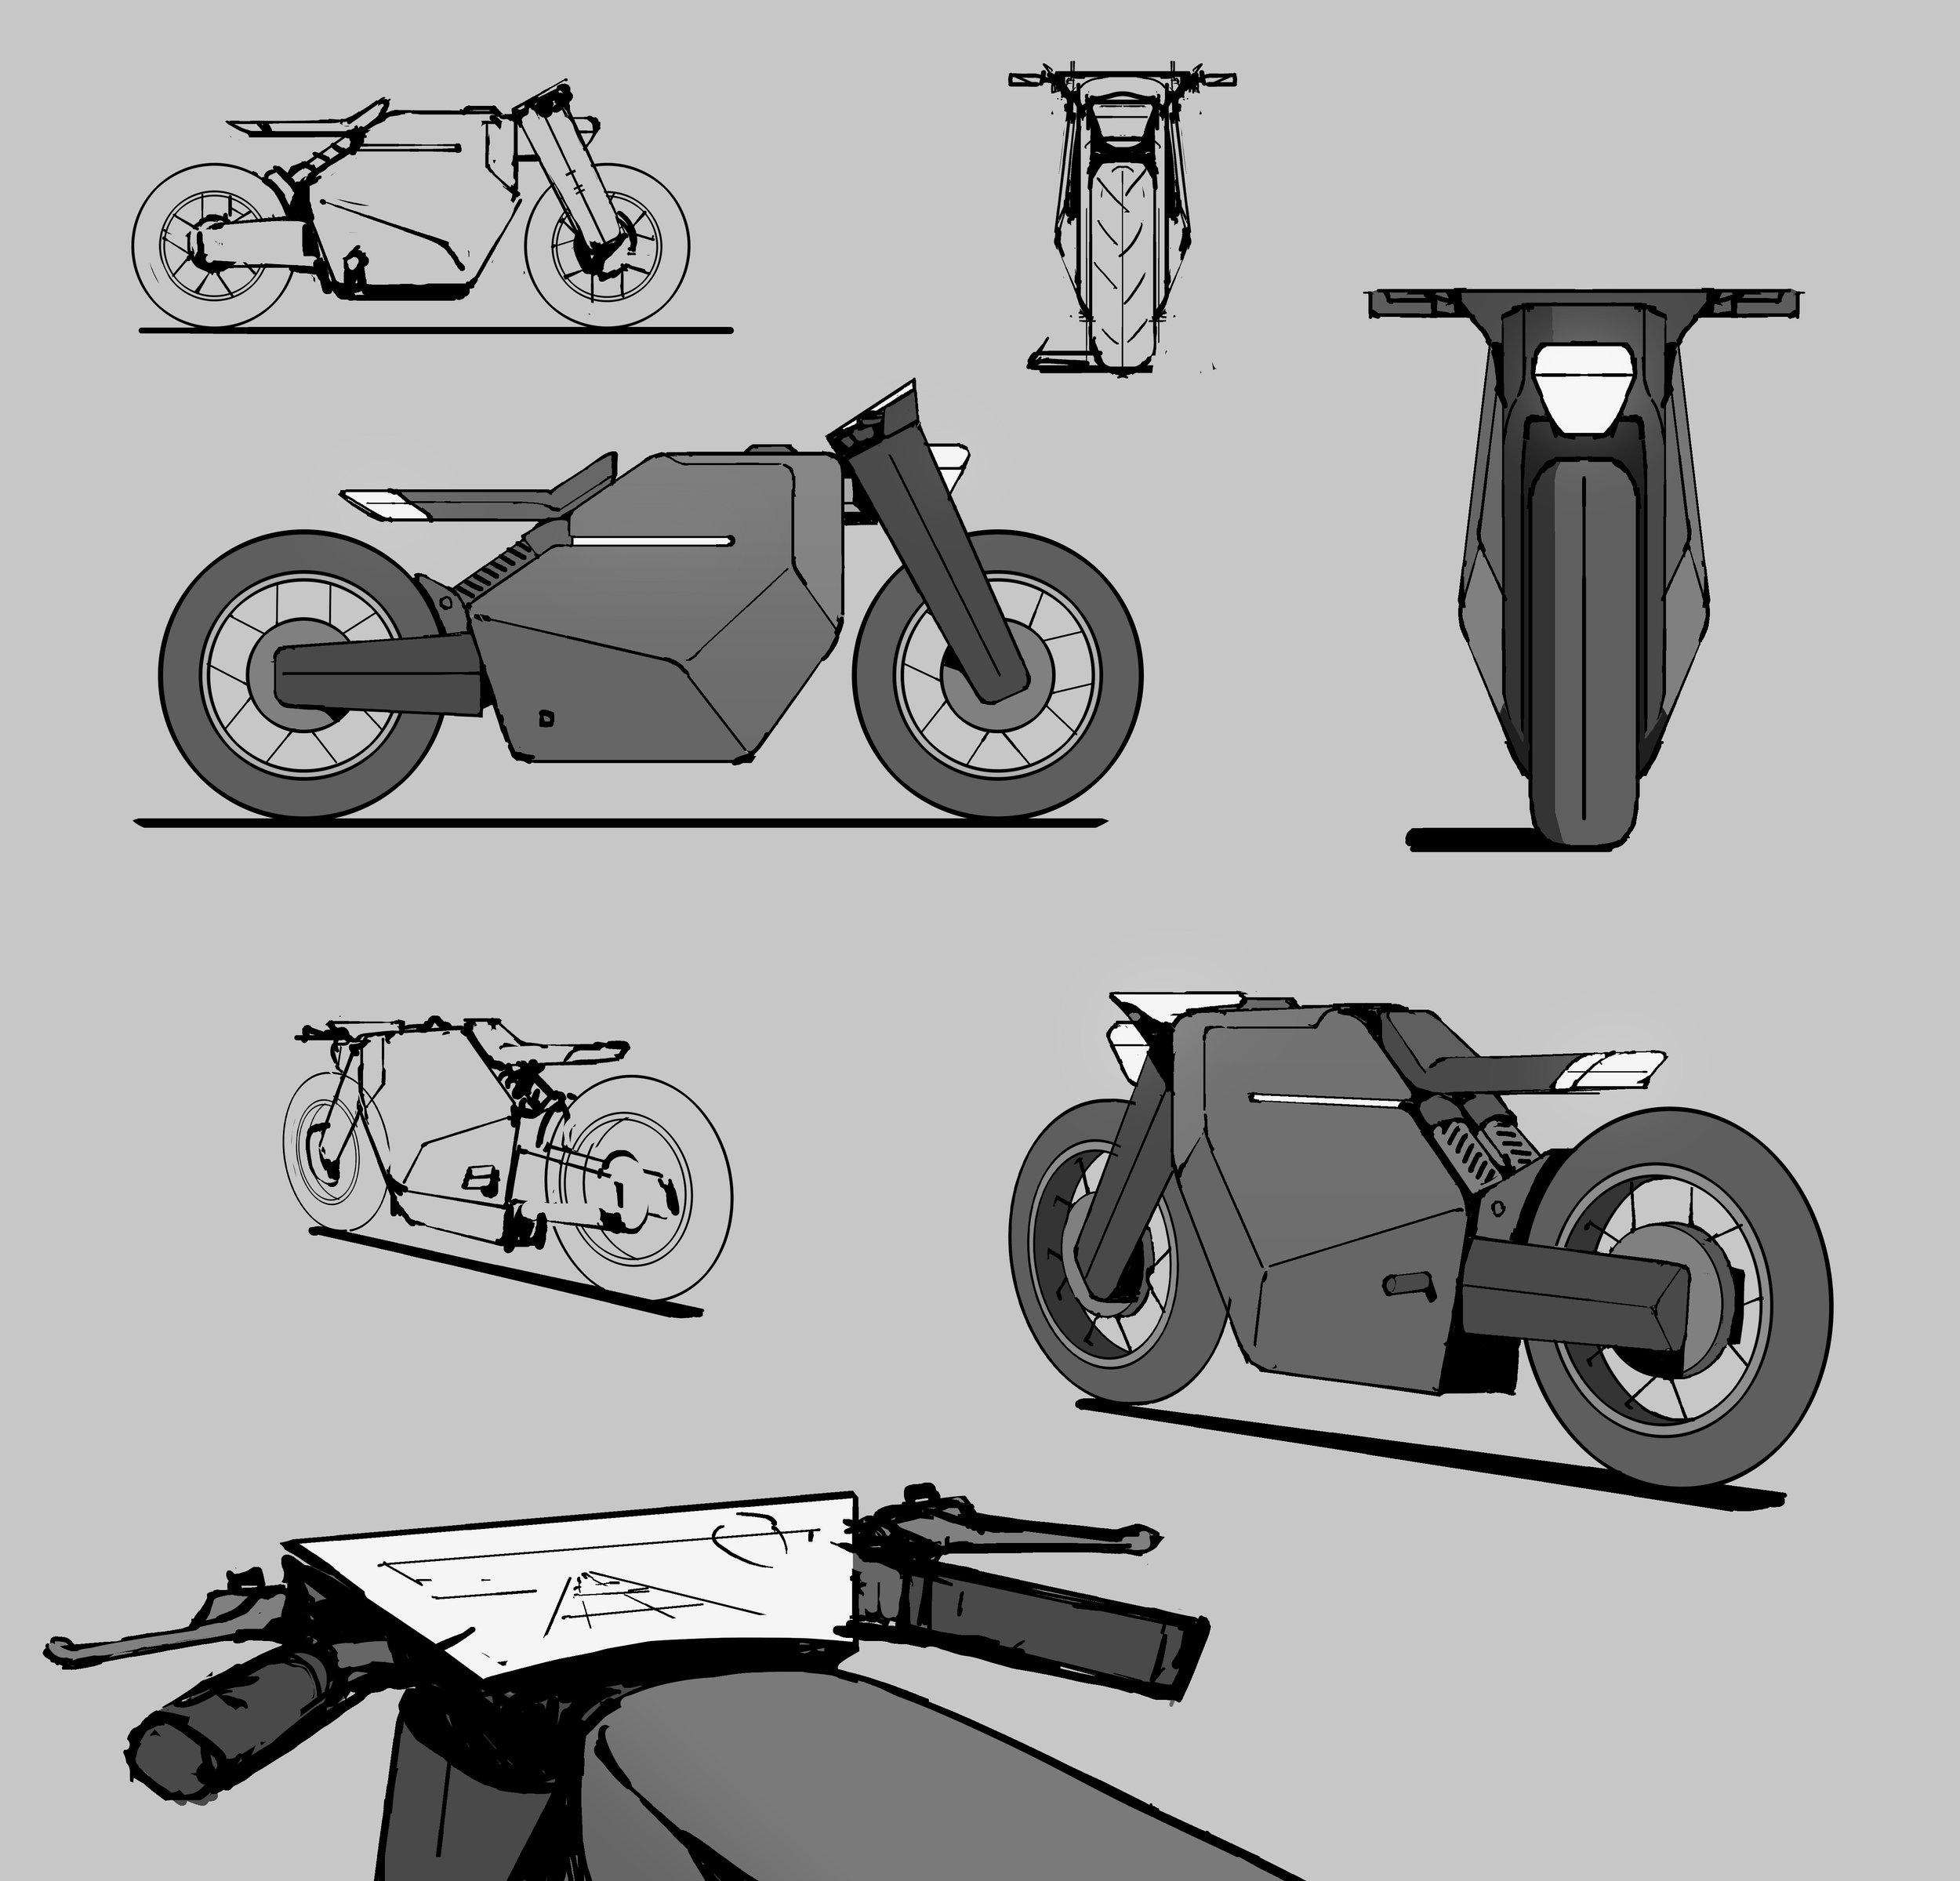 Designs by Hugo Moreno